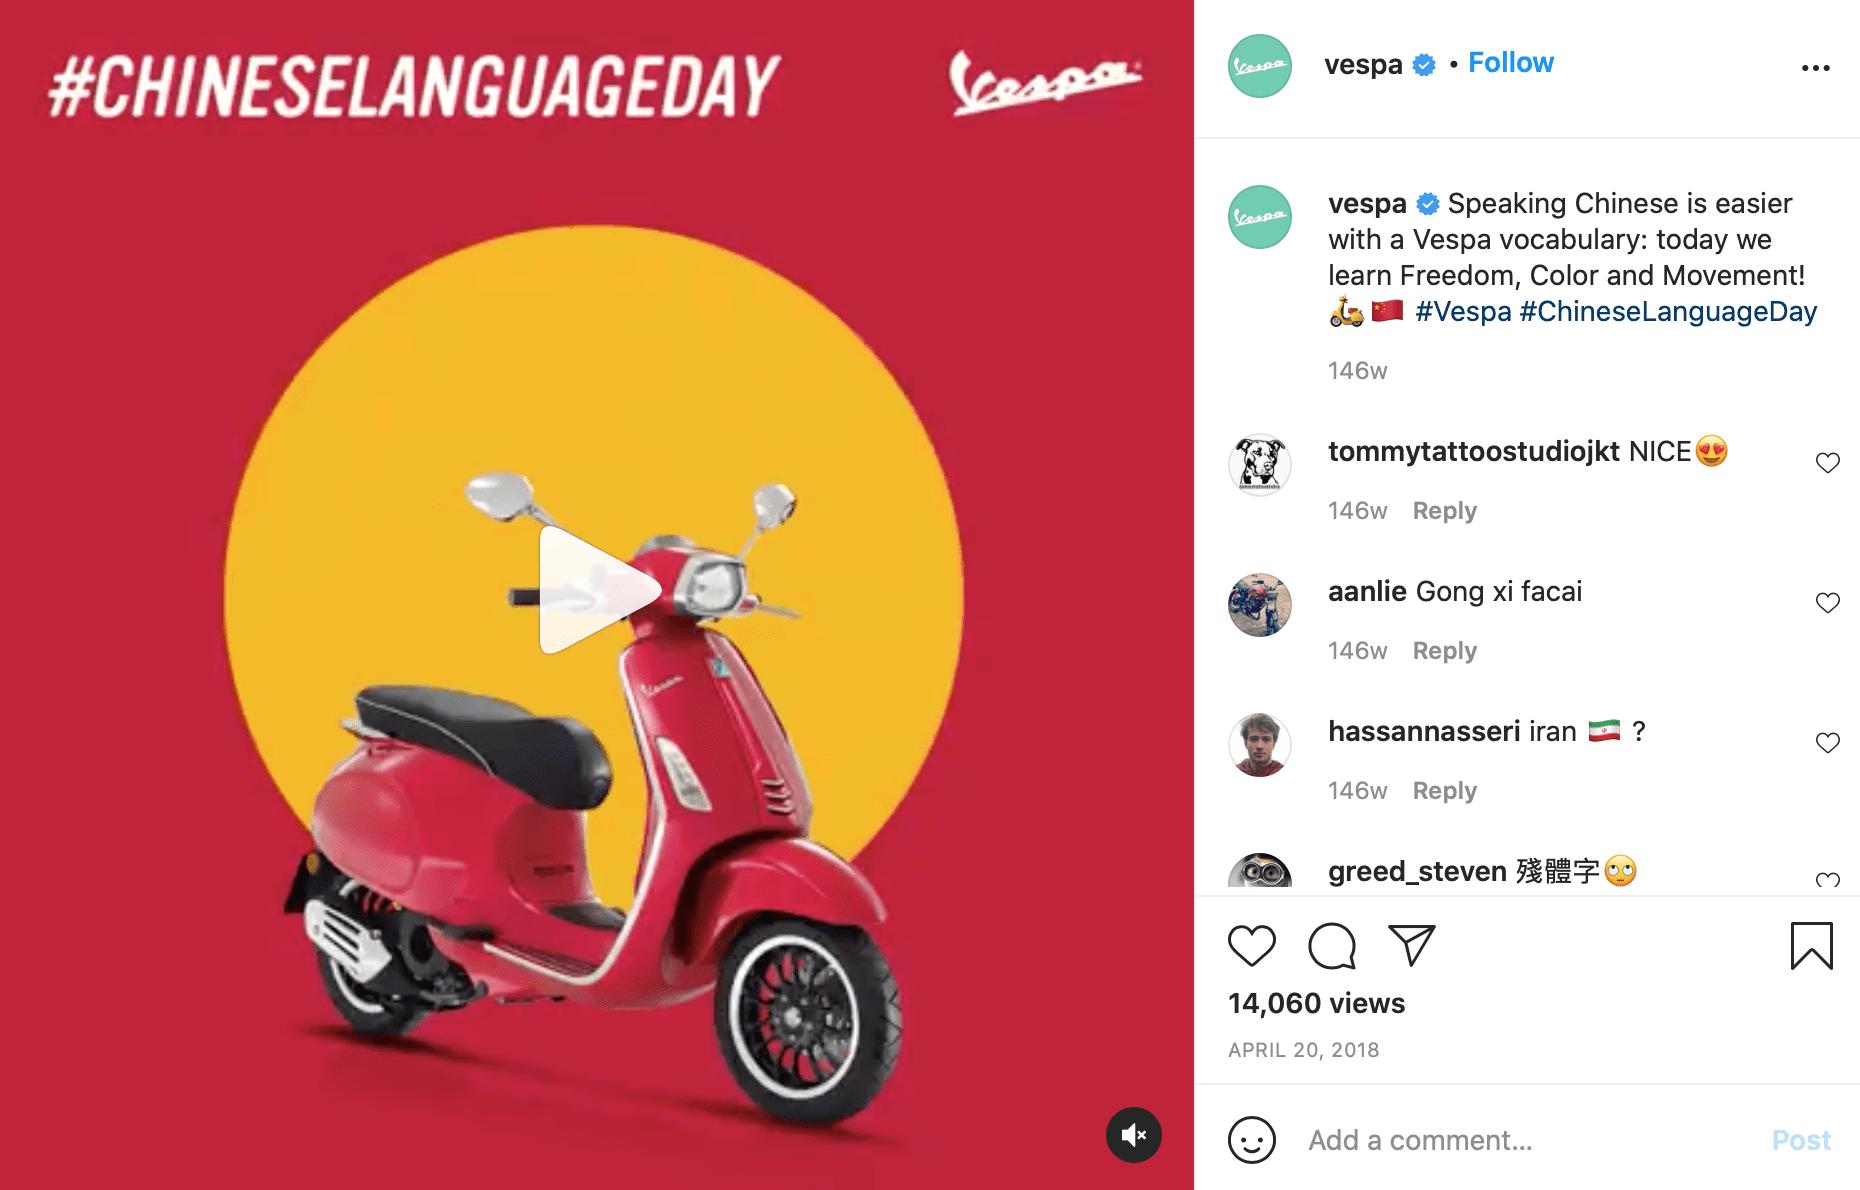 april social media calendar chinese language day